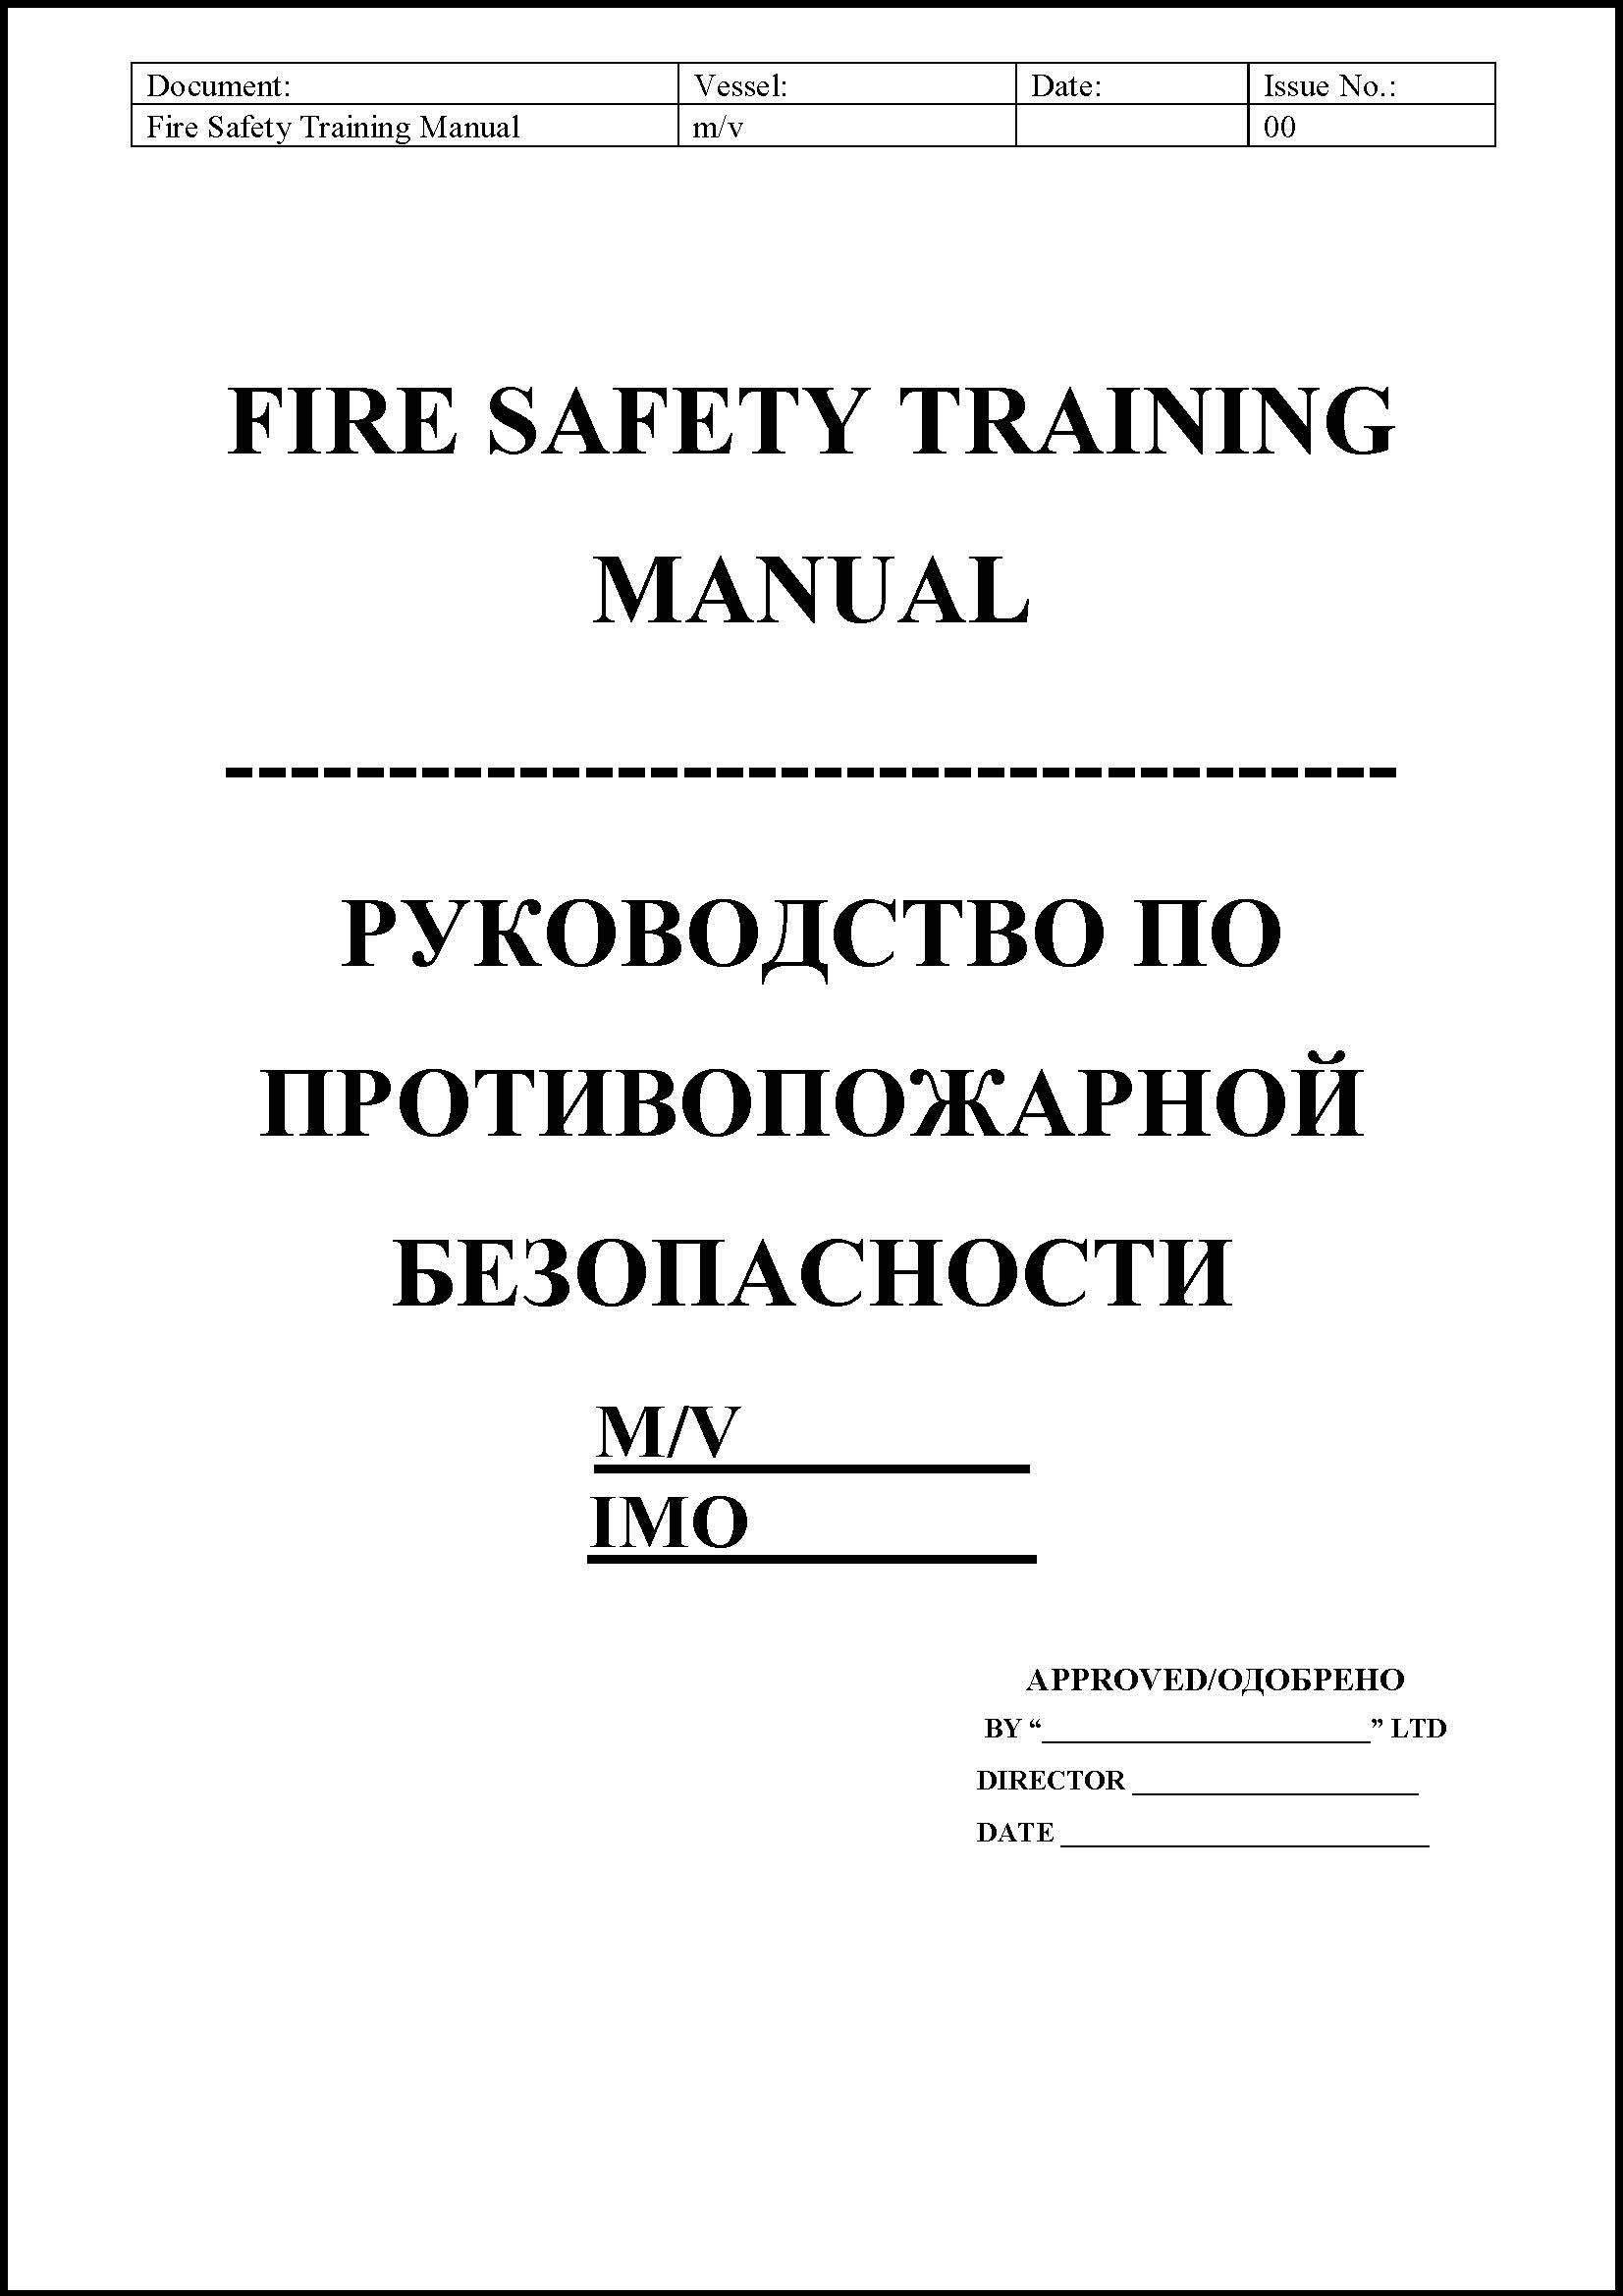 fire safety training manual msm rh marinesafety org ua safety training manual textile industry safety training manuals for plumbers